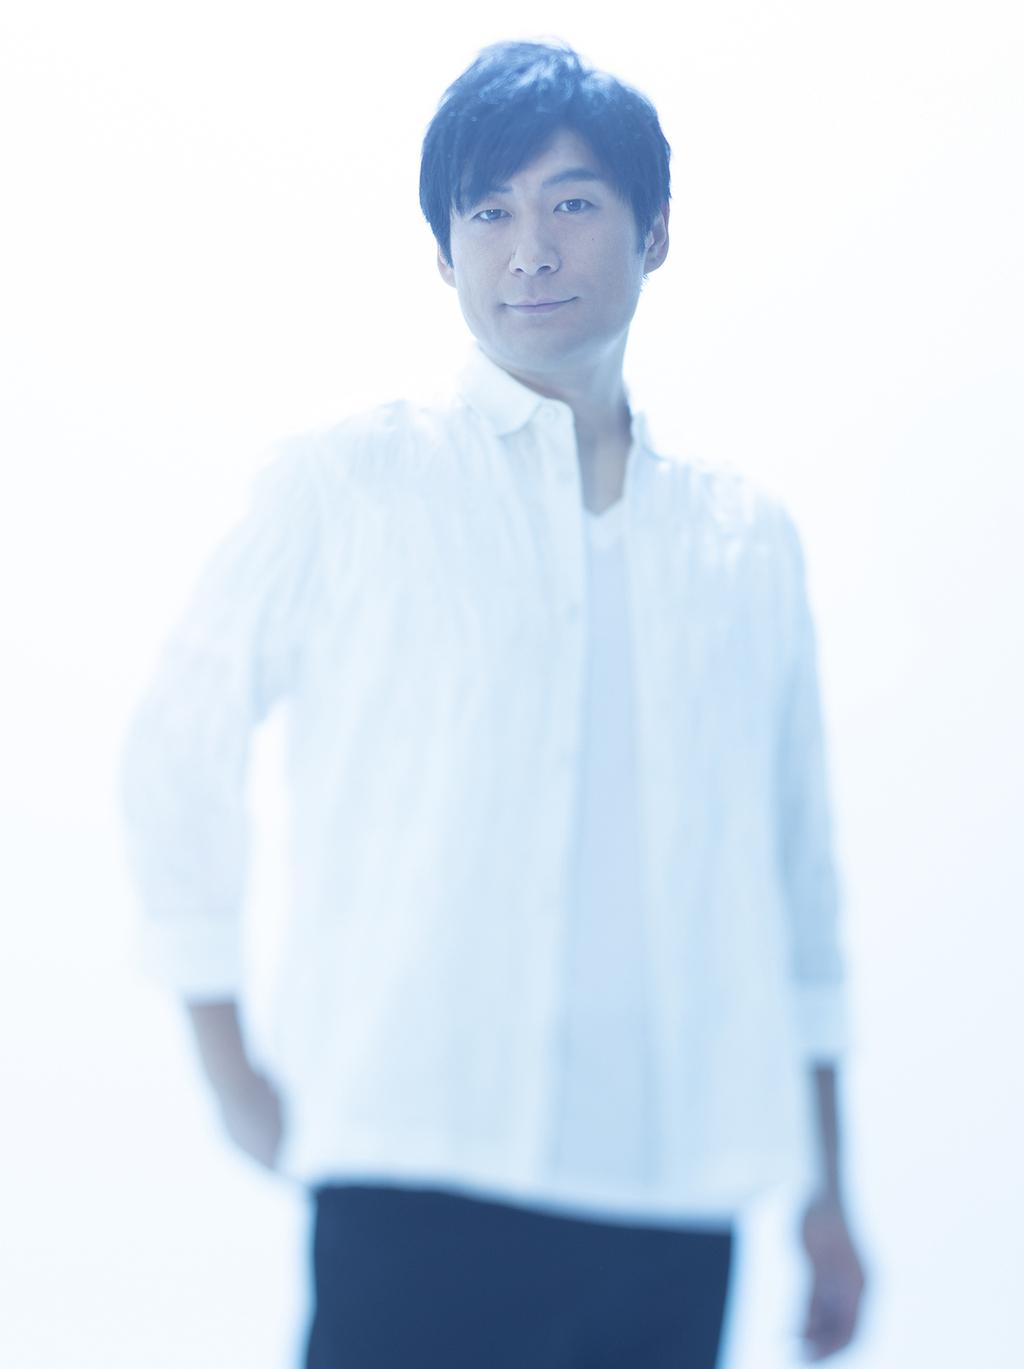 4468584-hamabatayohei_tsukinose_amain_mini_-_%e3%82%b3%e3%83%94%e3%83%bc